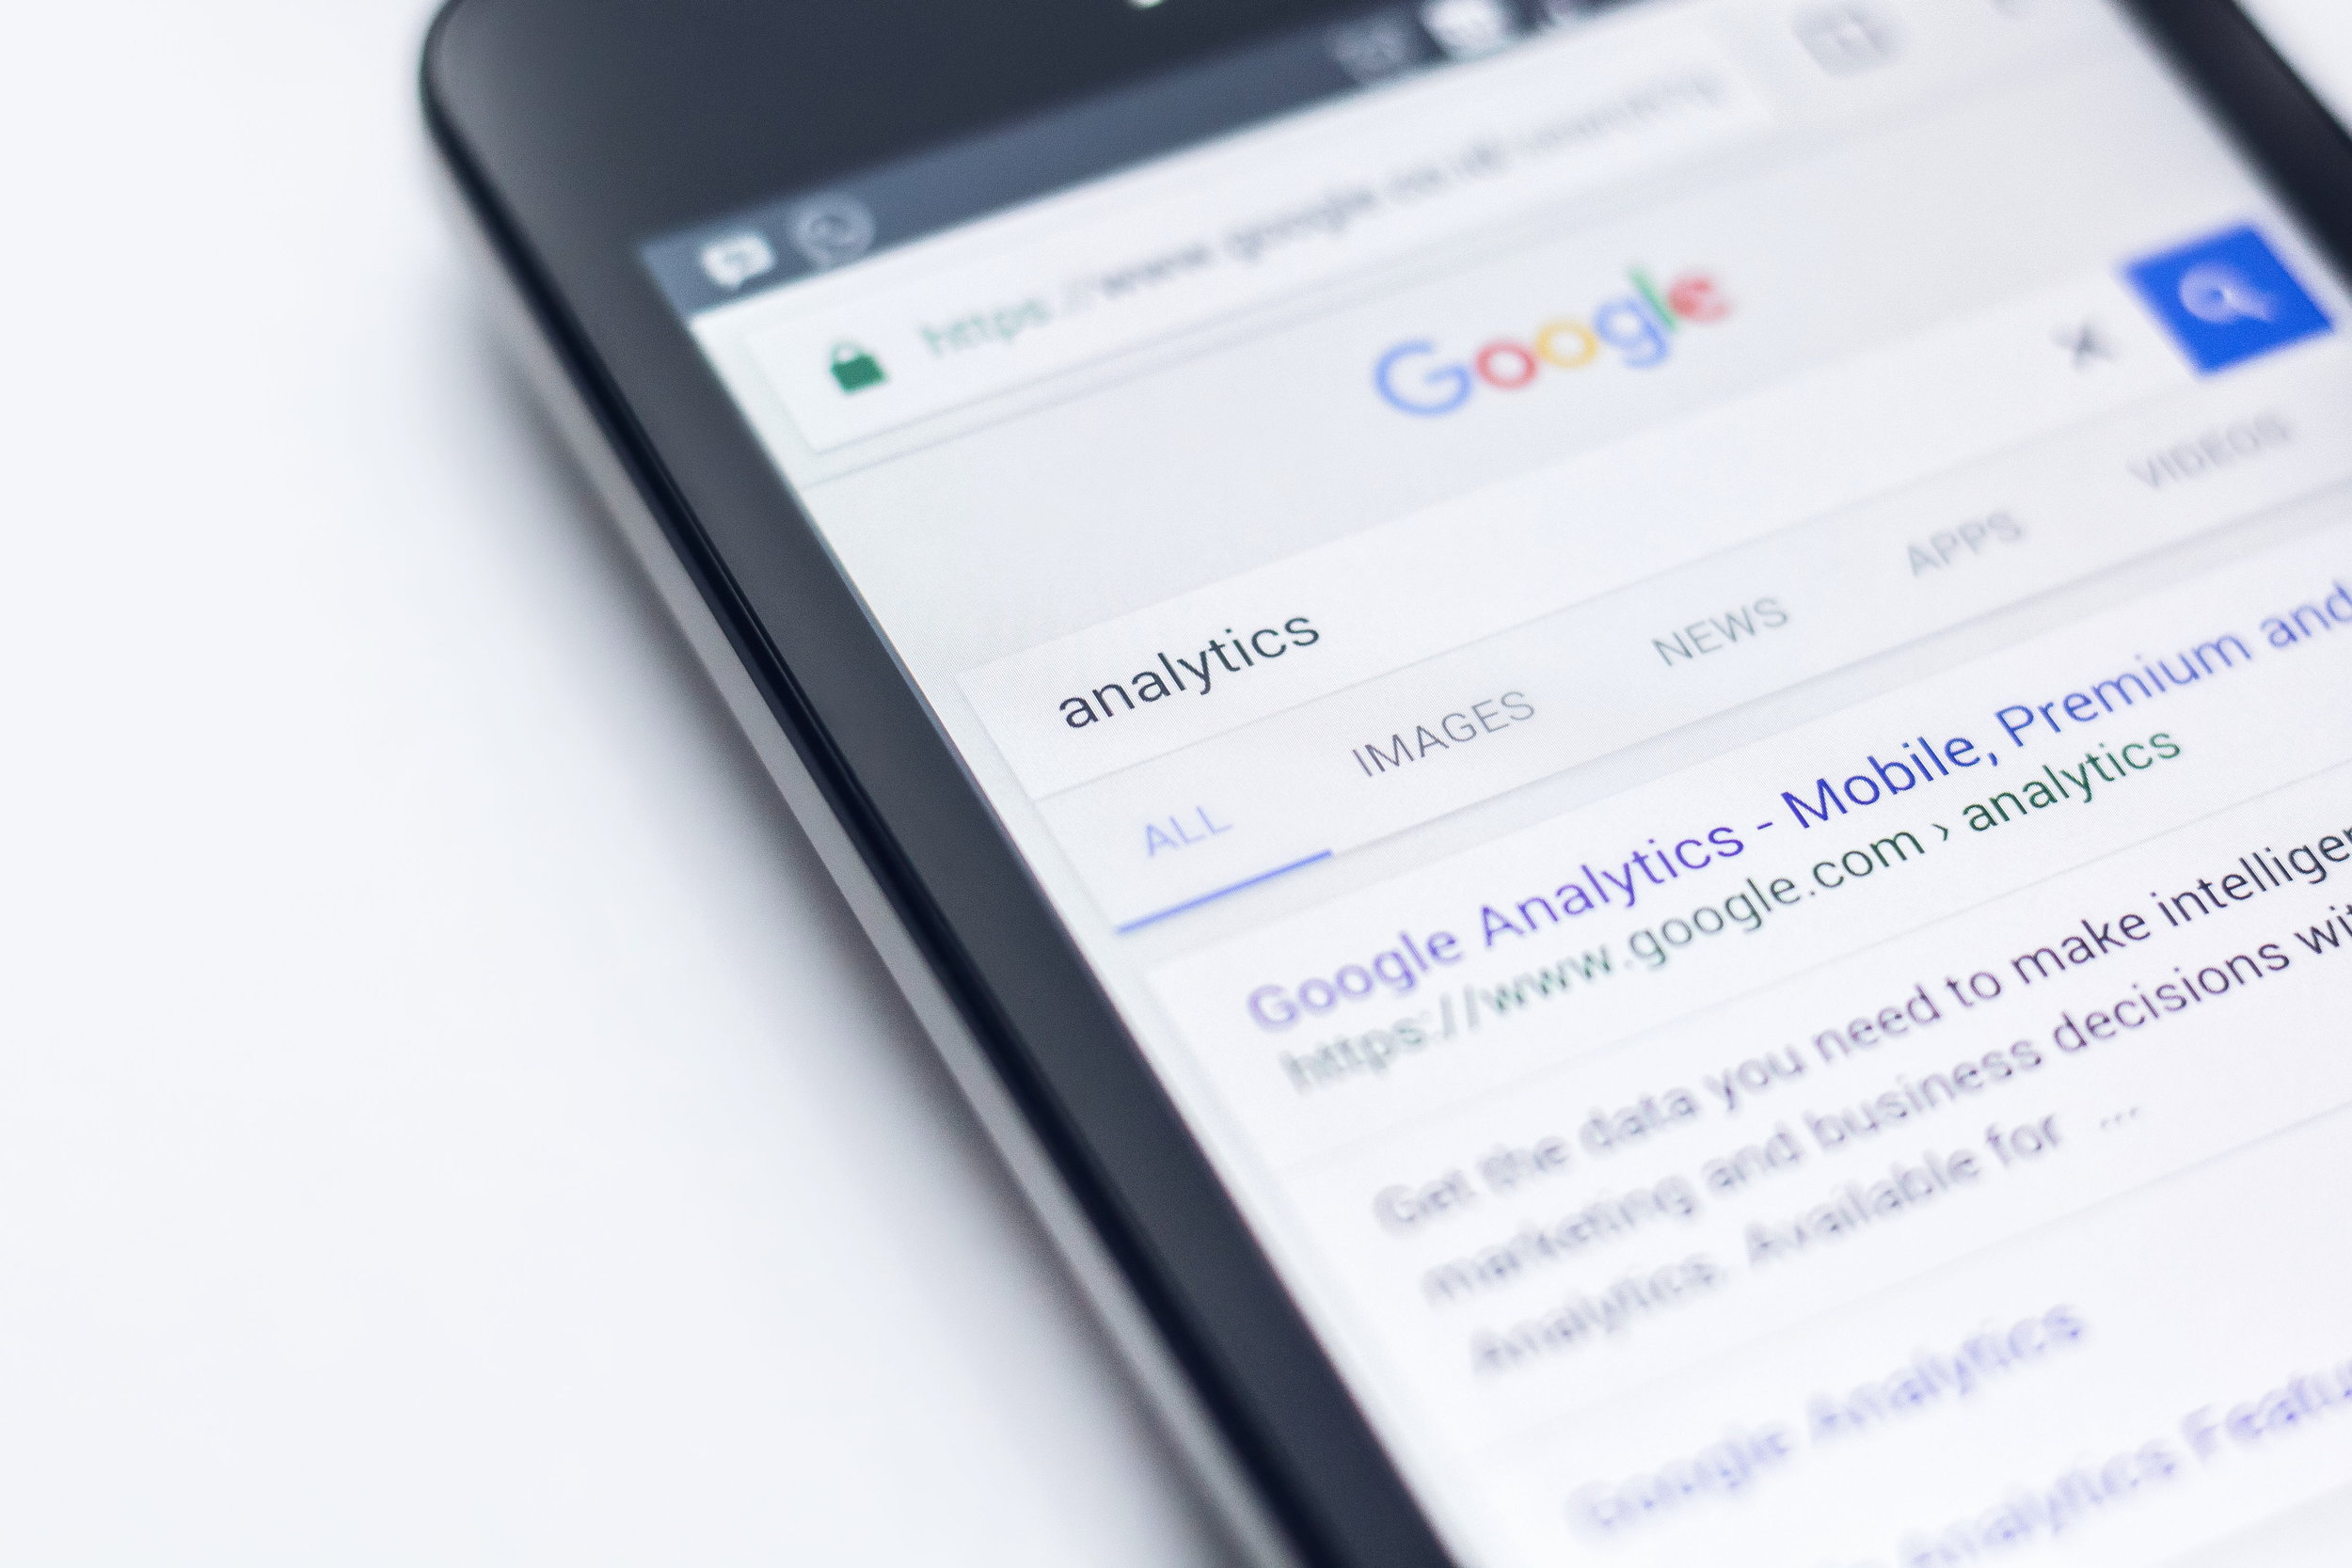 Cork Google Marketing Analytics Website Design Reports Tracking Online